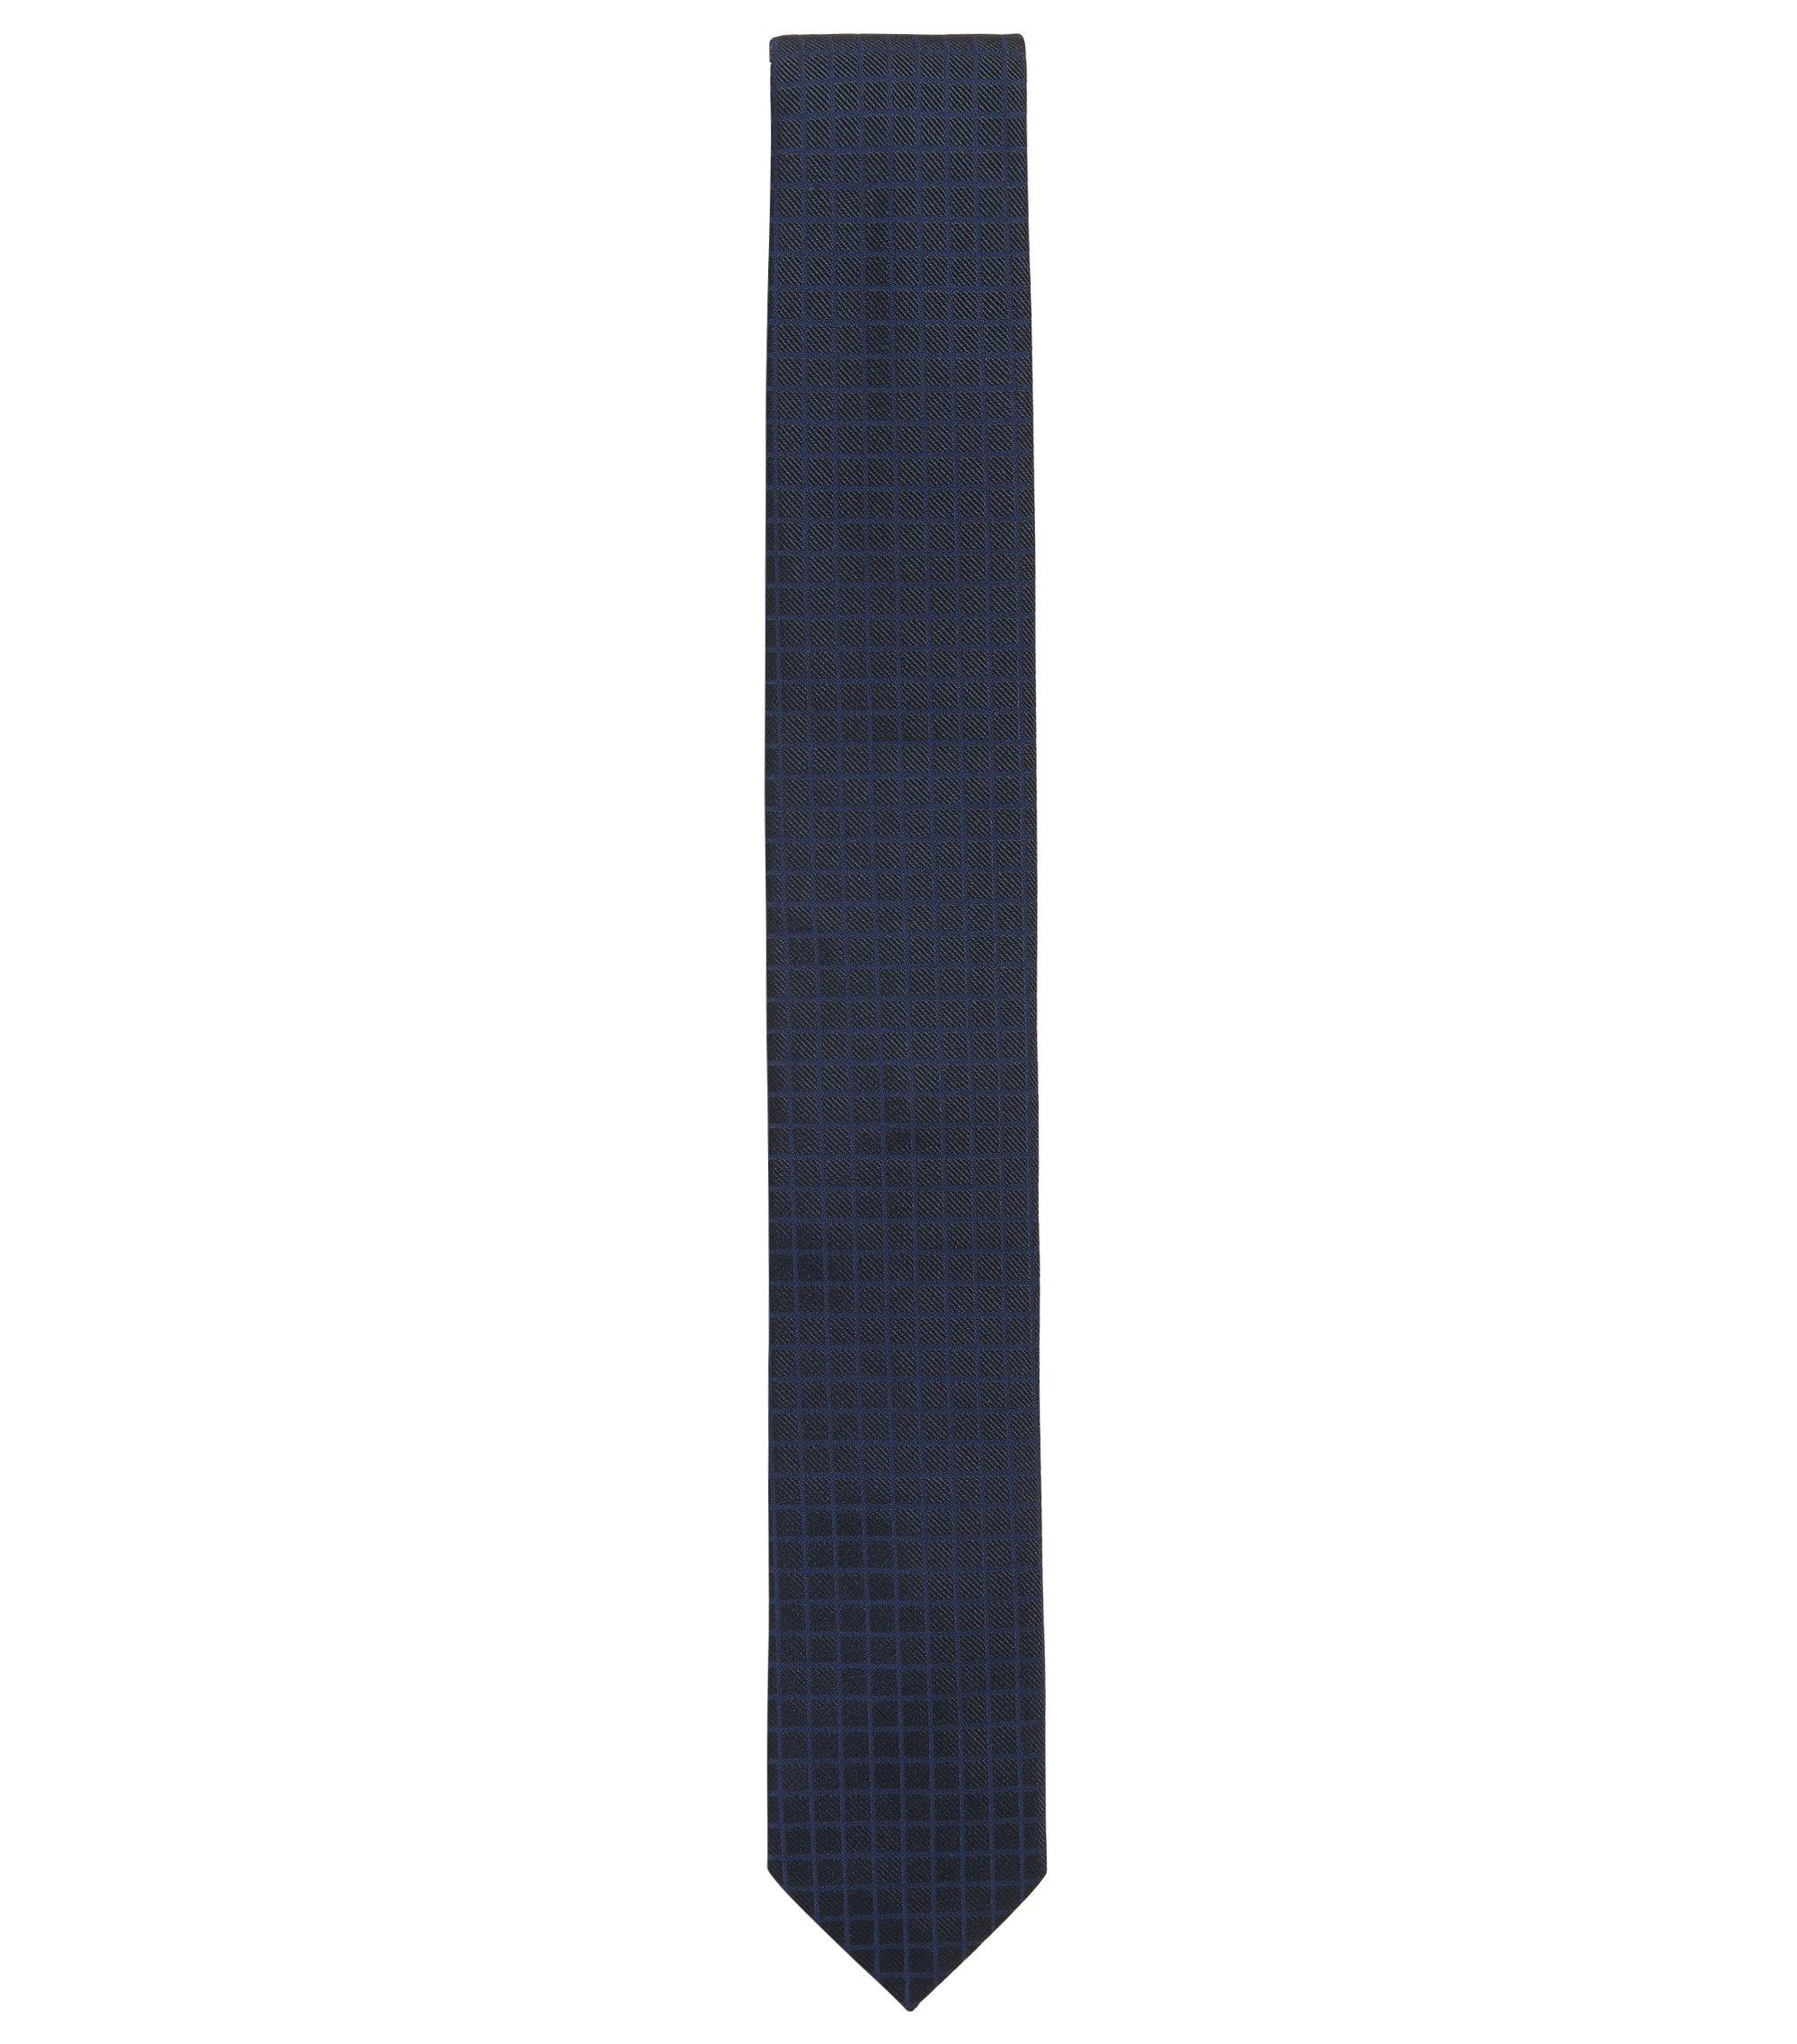 Krawatte aus Seiden-Jacquard mit Karo-Struktur, Dunkelblau